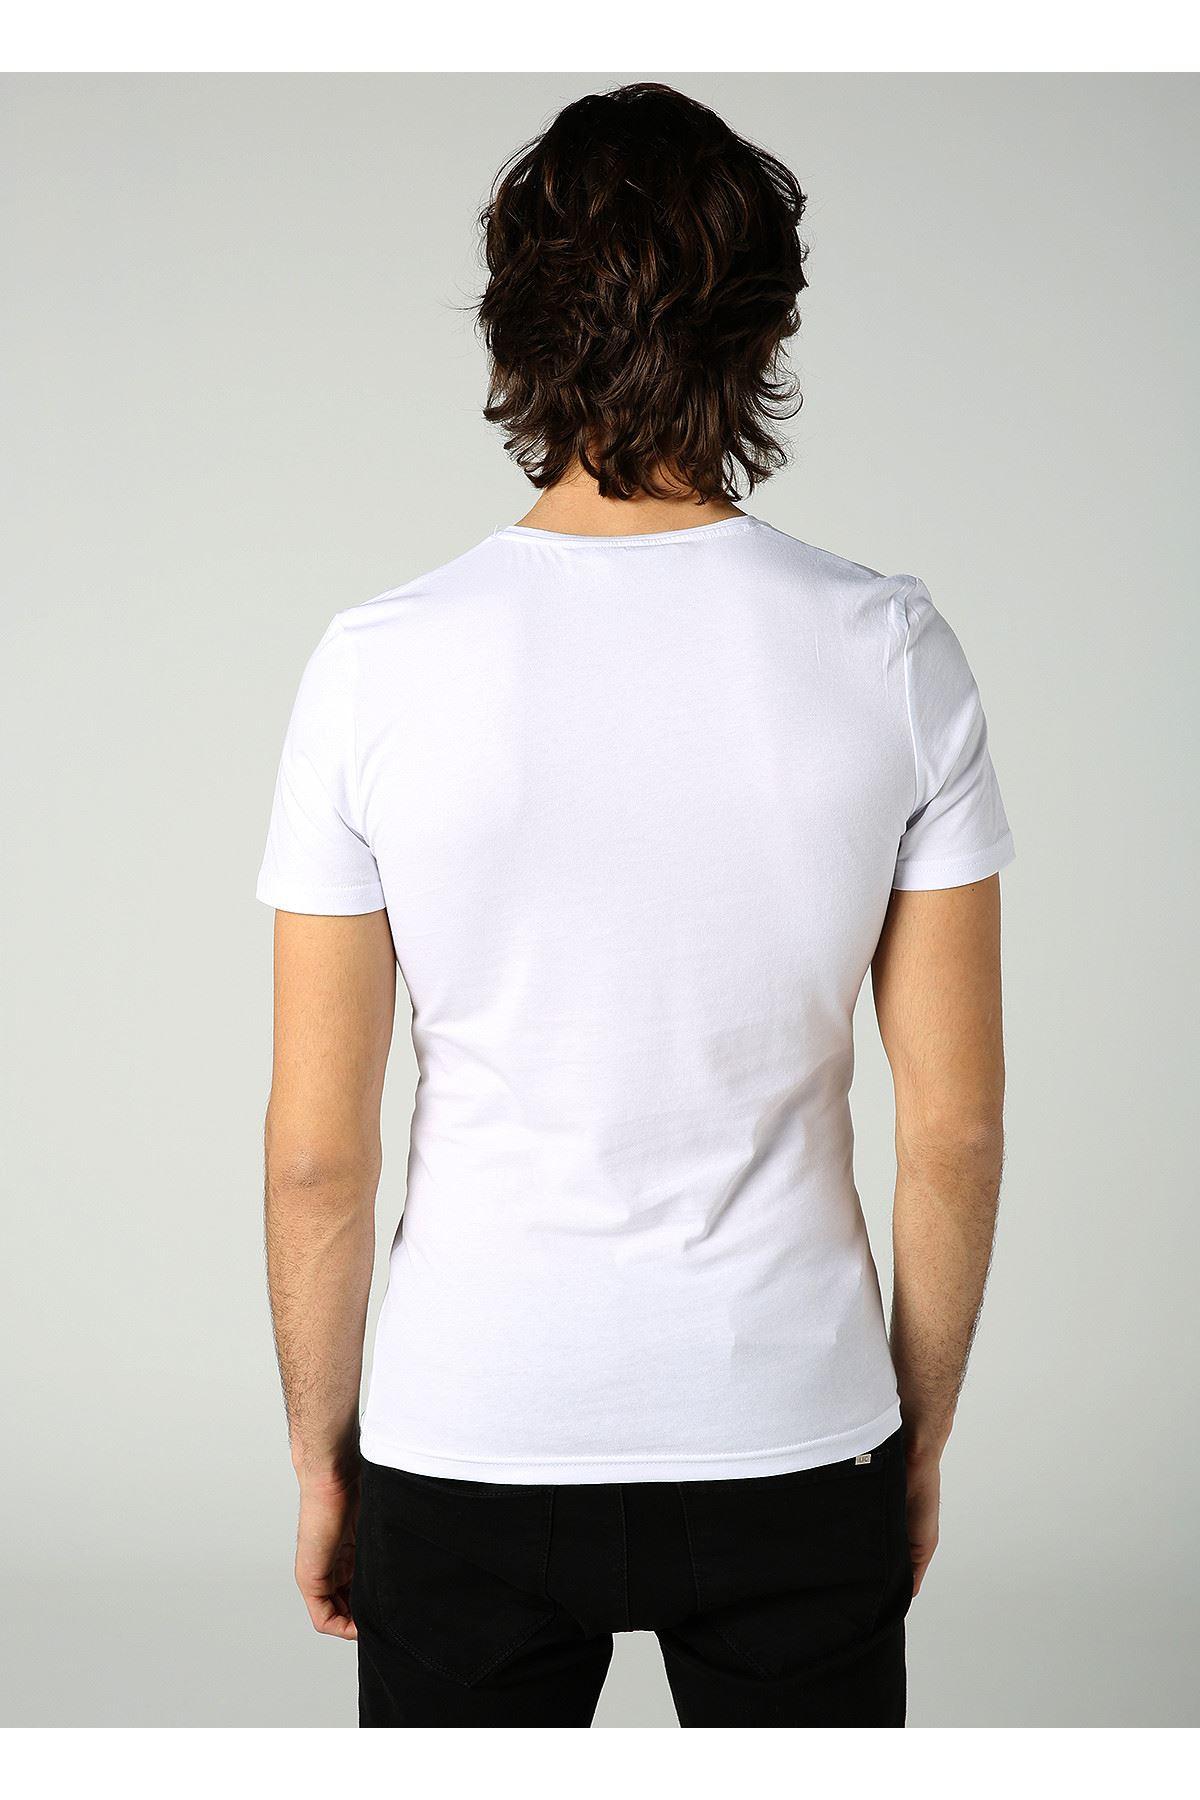 Bisiklet Yaka Parmak İzi Baskılı Erkek Beyaz T-Shirt